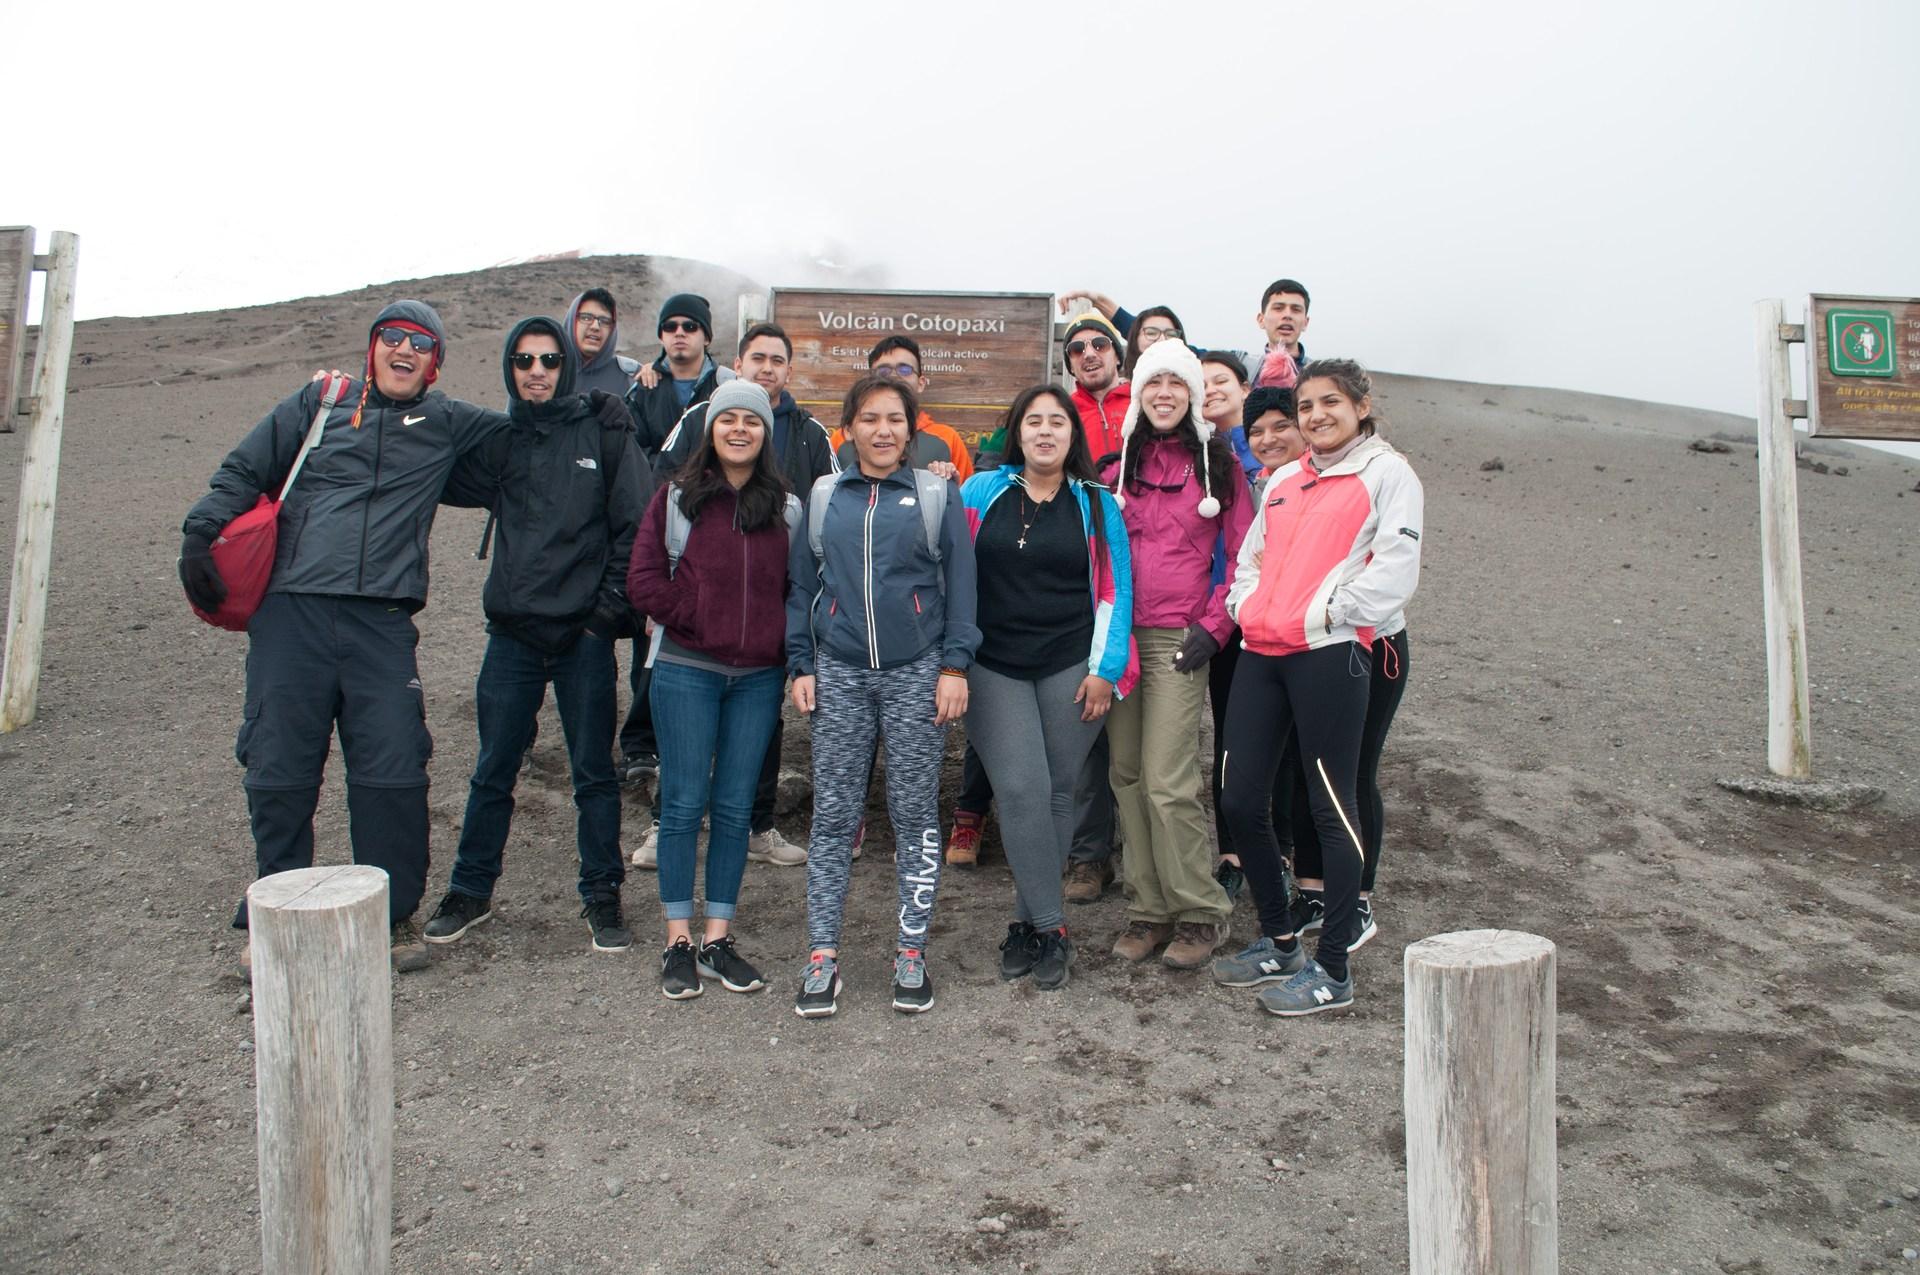 Cotopaxi volcano peak.